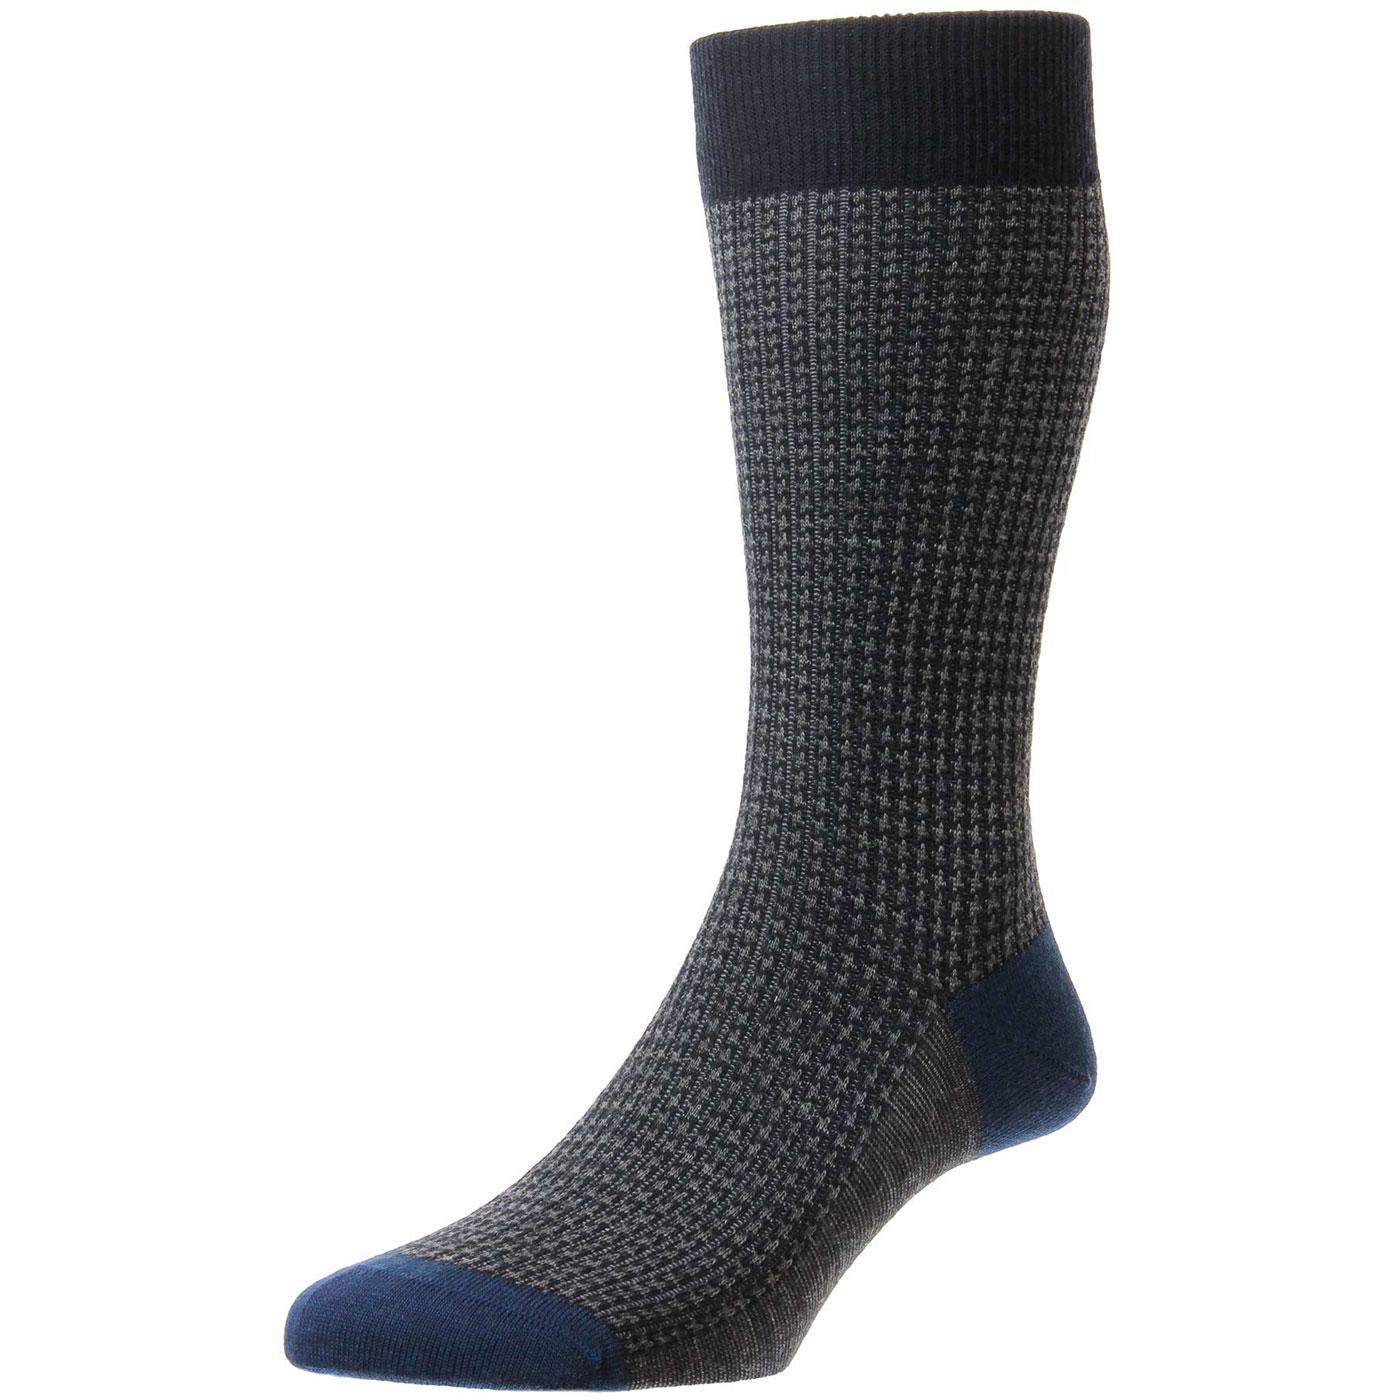 + Hatherley PANTHERELLA Men's Vintage Merino Socks